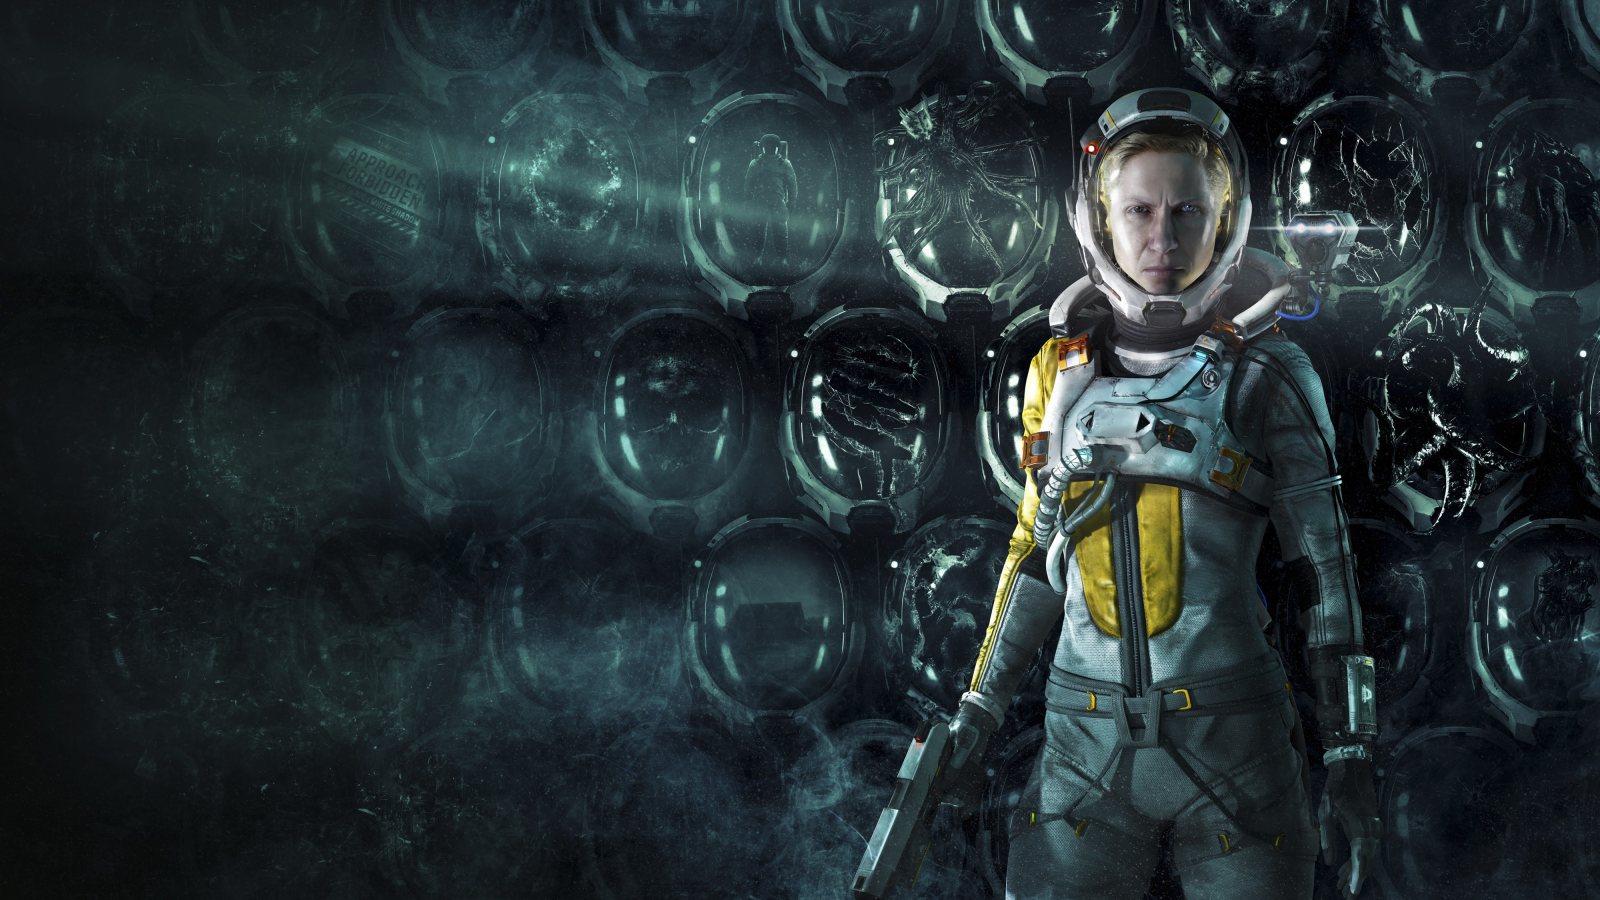 PS5独占科幻射击游戏《Returnal》公布全新实机宣传片